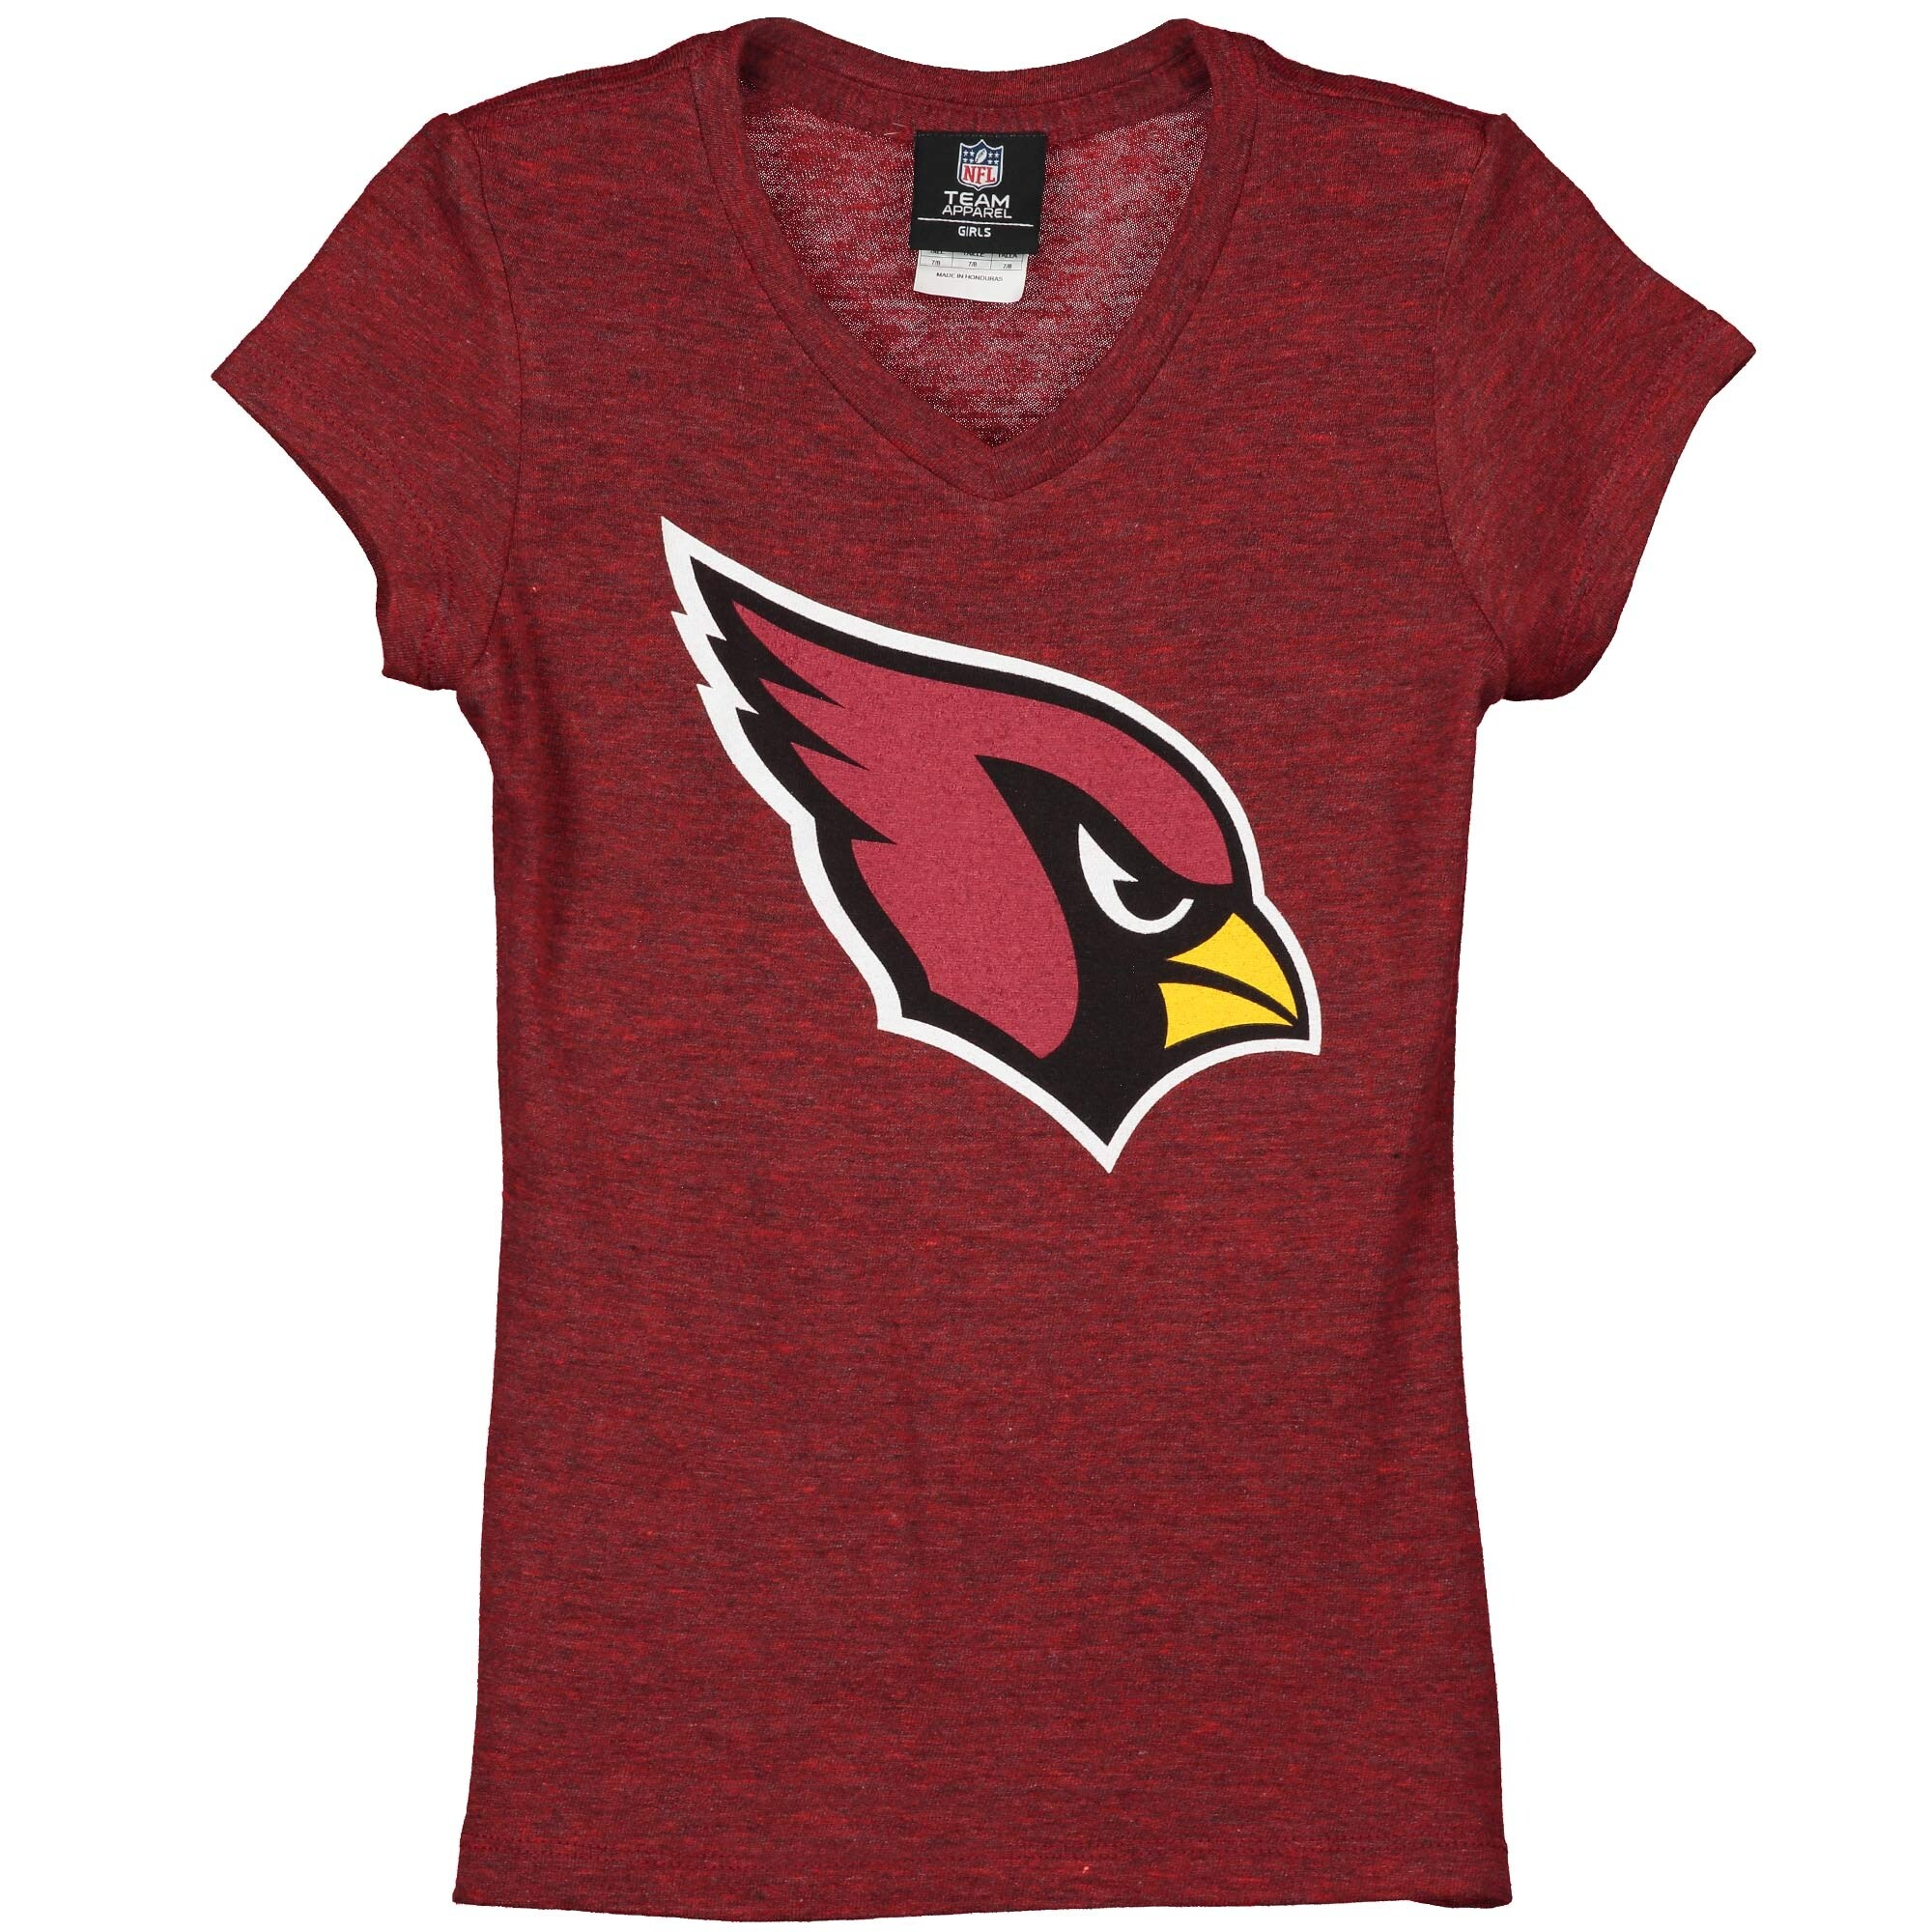 Arizona Cardinals 5th & Ocean by New Era Girls Youth Basic Logo Tri-Blend V-Neck T-Shirt - Cardinal